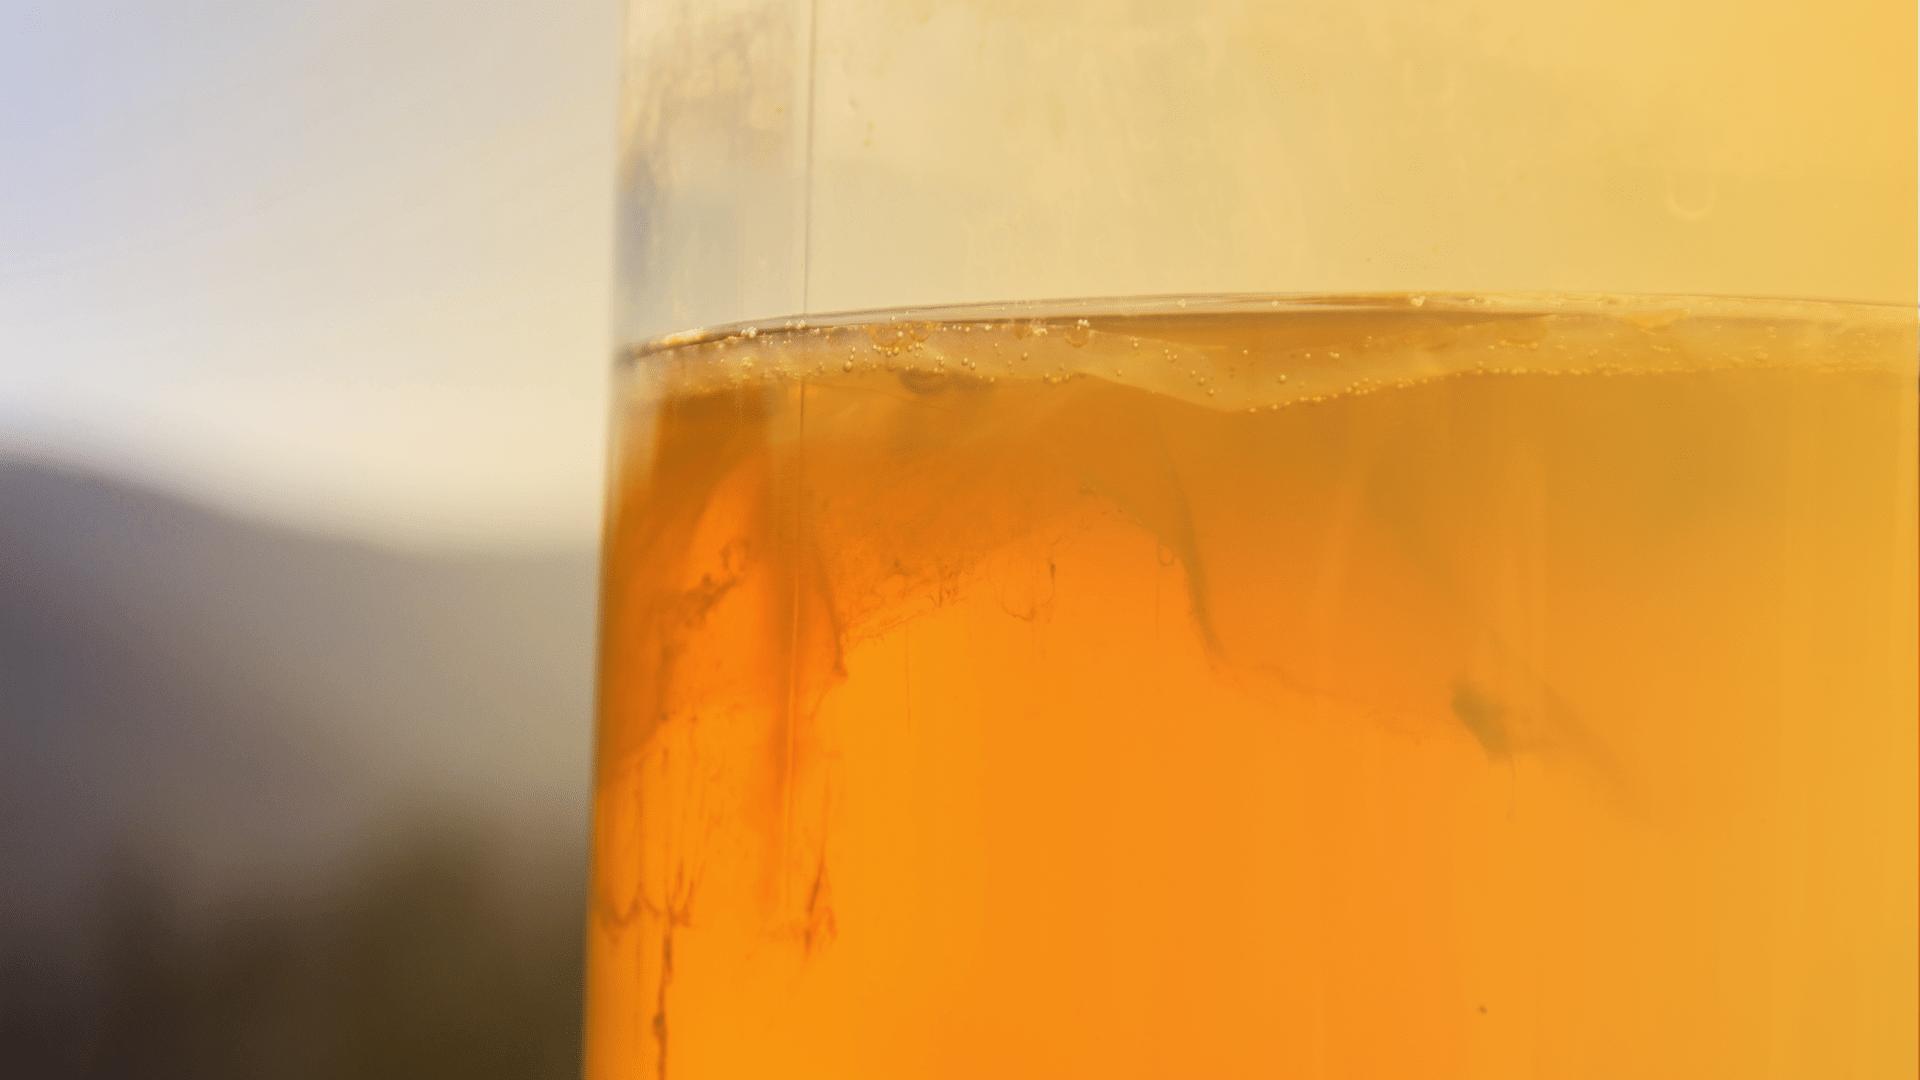 close-up of a glass of kombucha